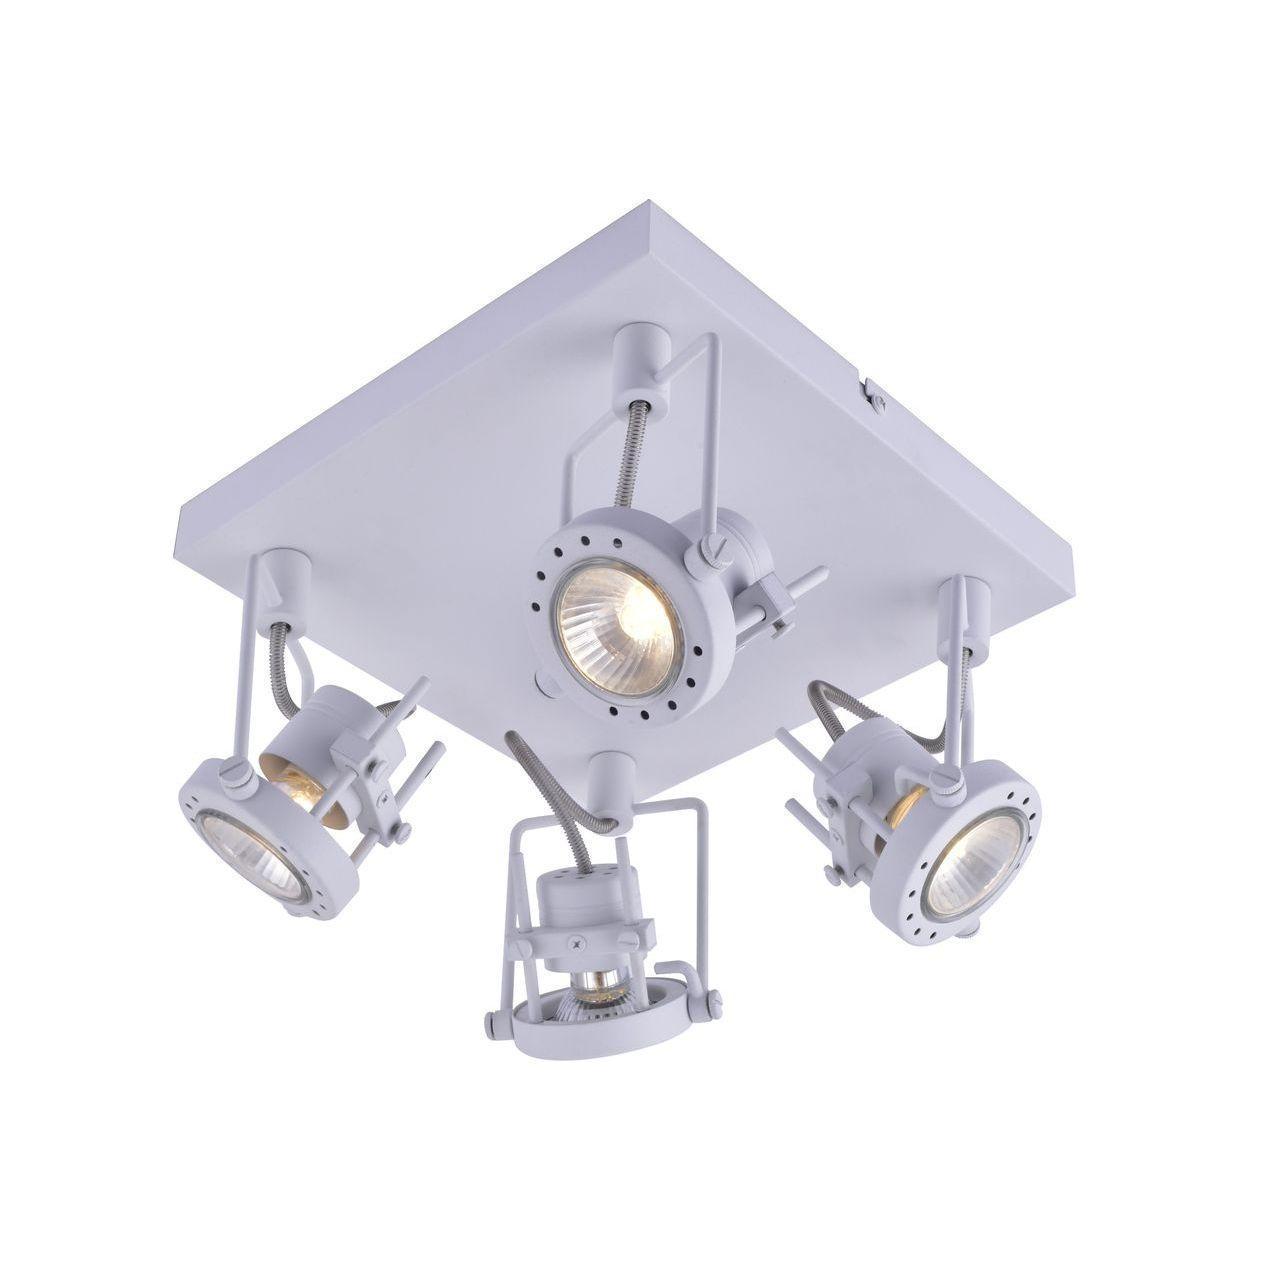 Фото - Спот Arte Lamp Costruttore A4300PL-4WH спот arte lamp costruttore a4300pl 4ab